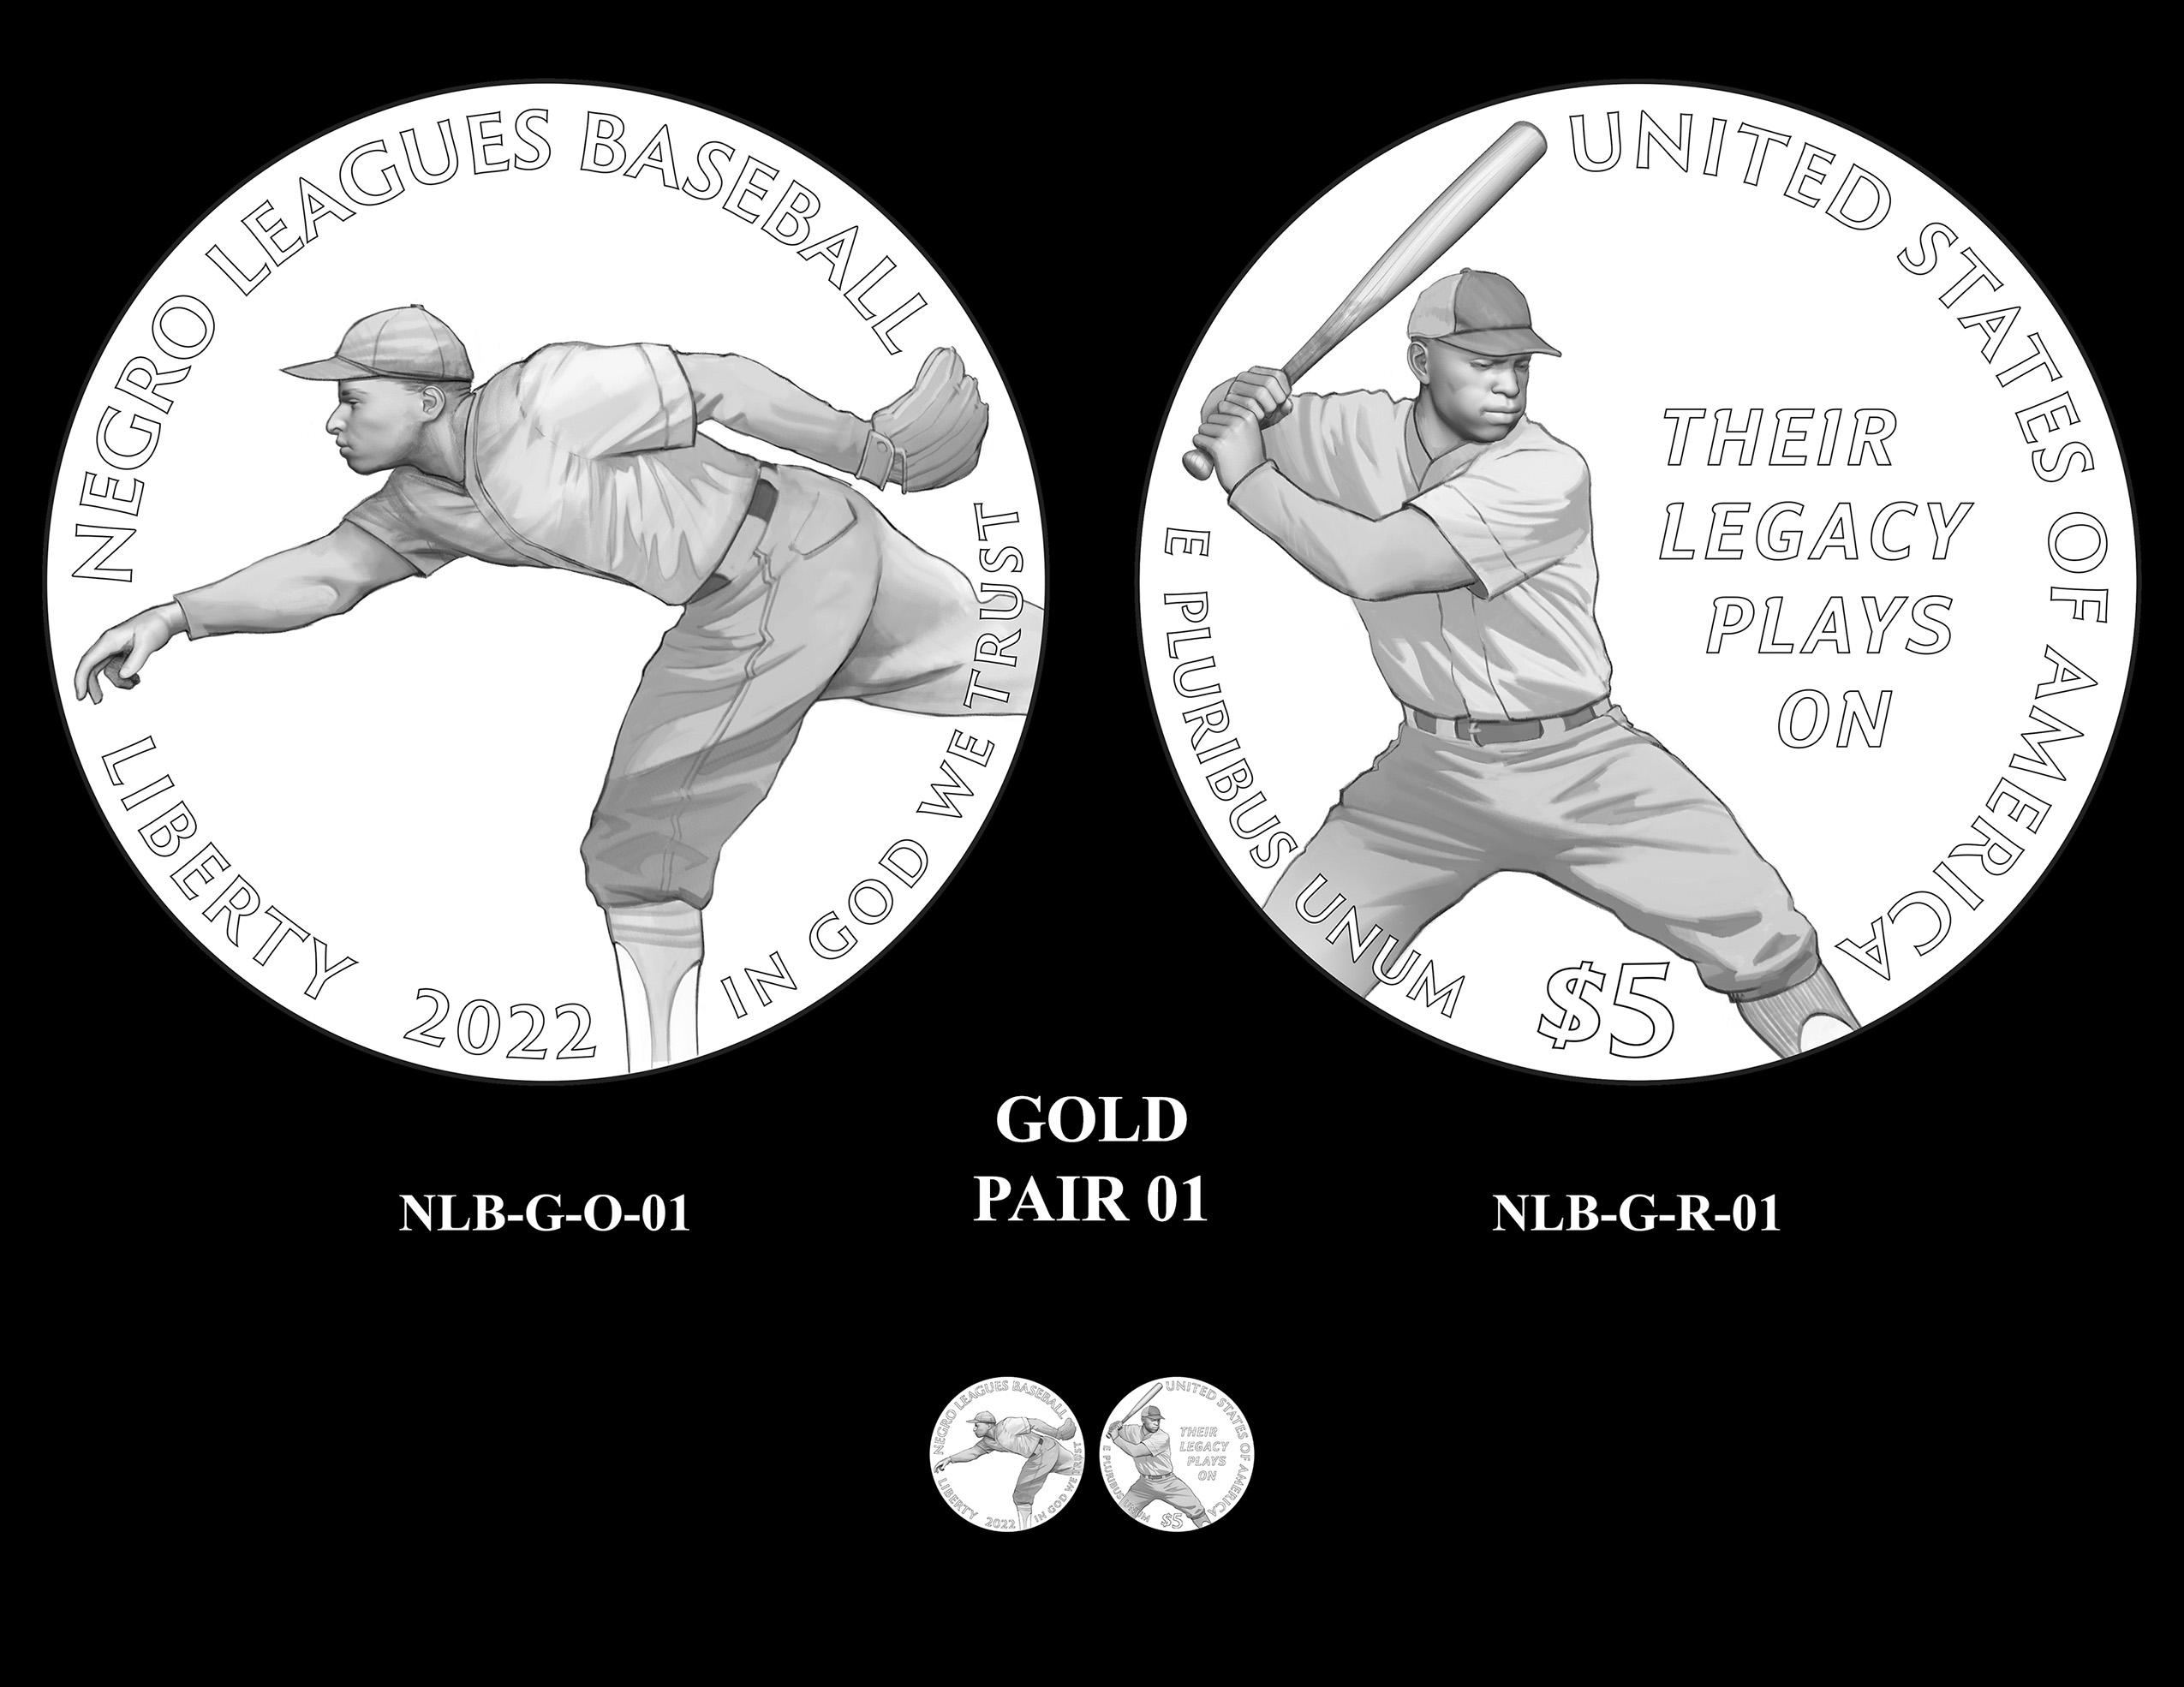 Gold Pair 01 -- Negro Leagues Baseball Commemorative Coin Program